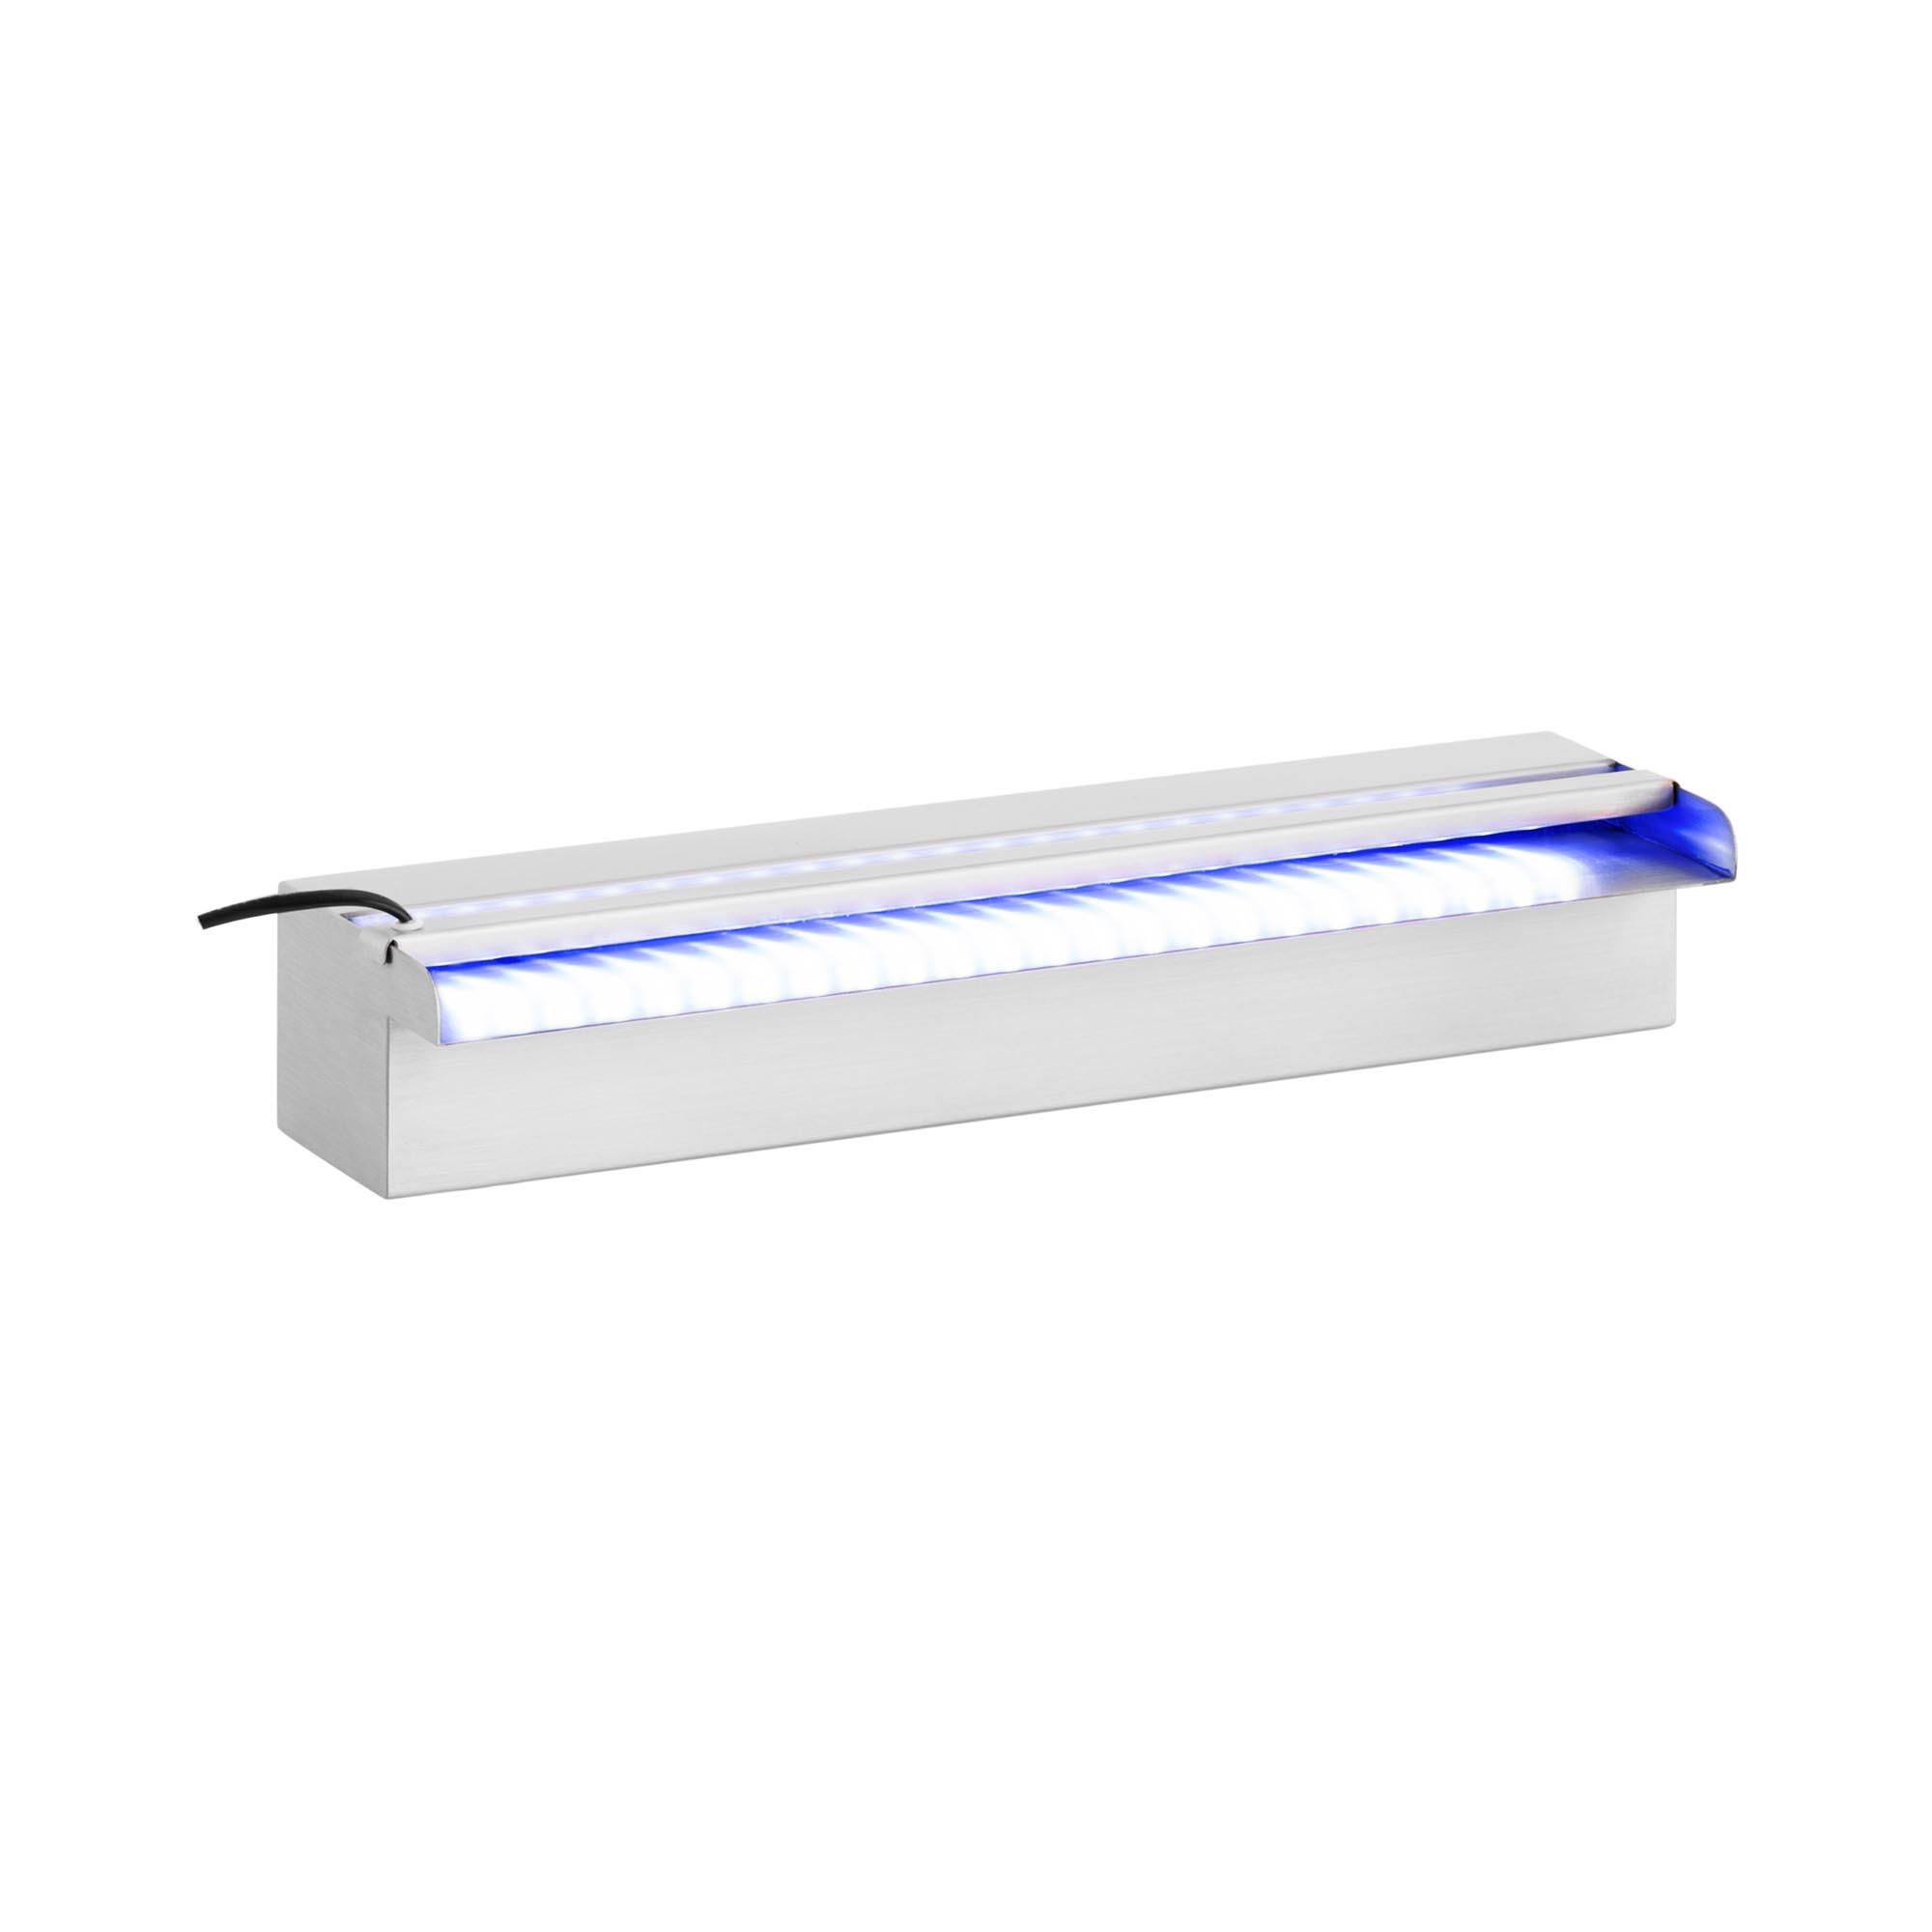 Uniprodo Schwalldusche Pool - 60 cm - LED-Beleuchtung 10250300